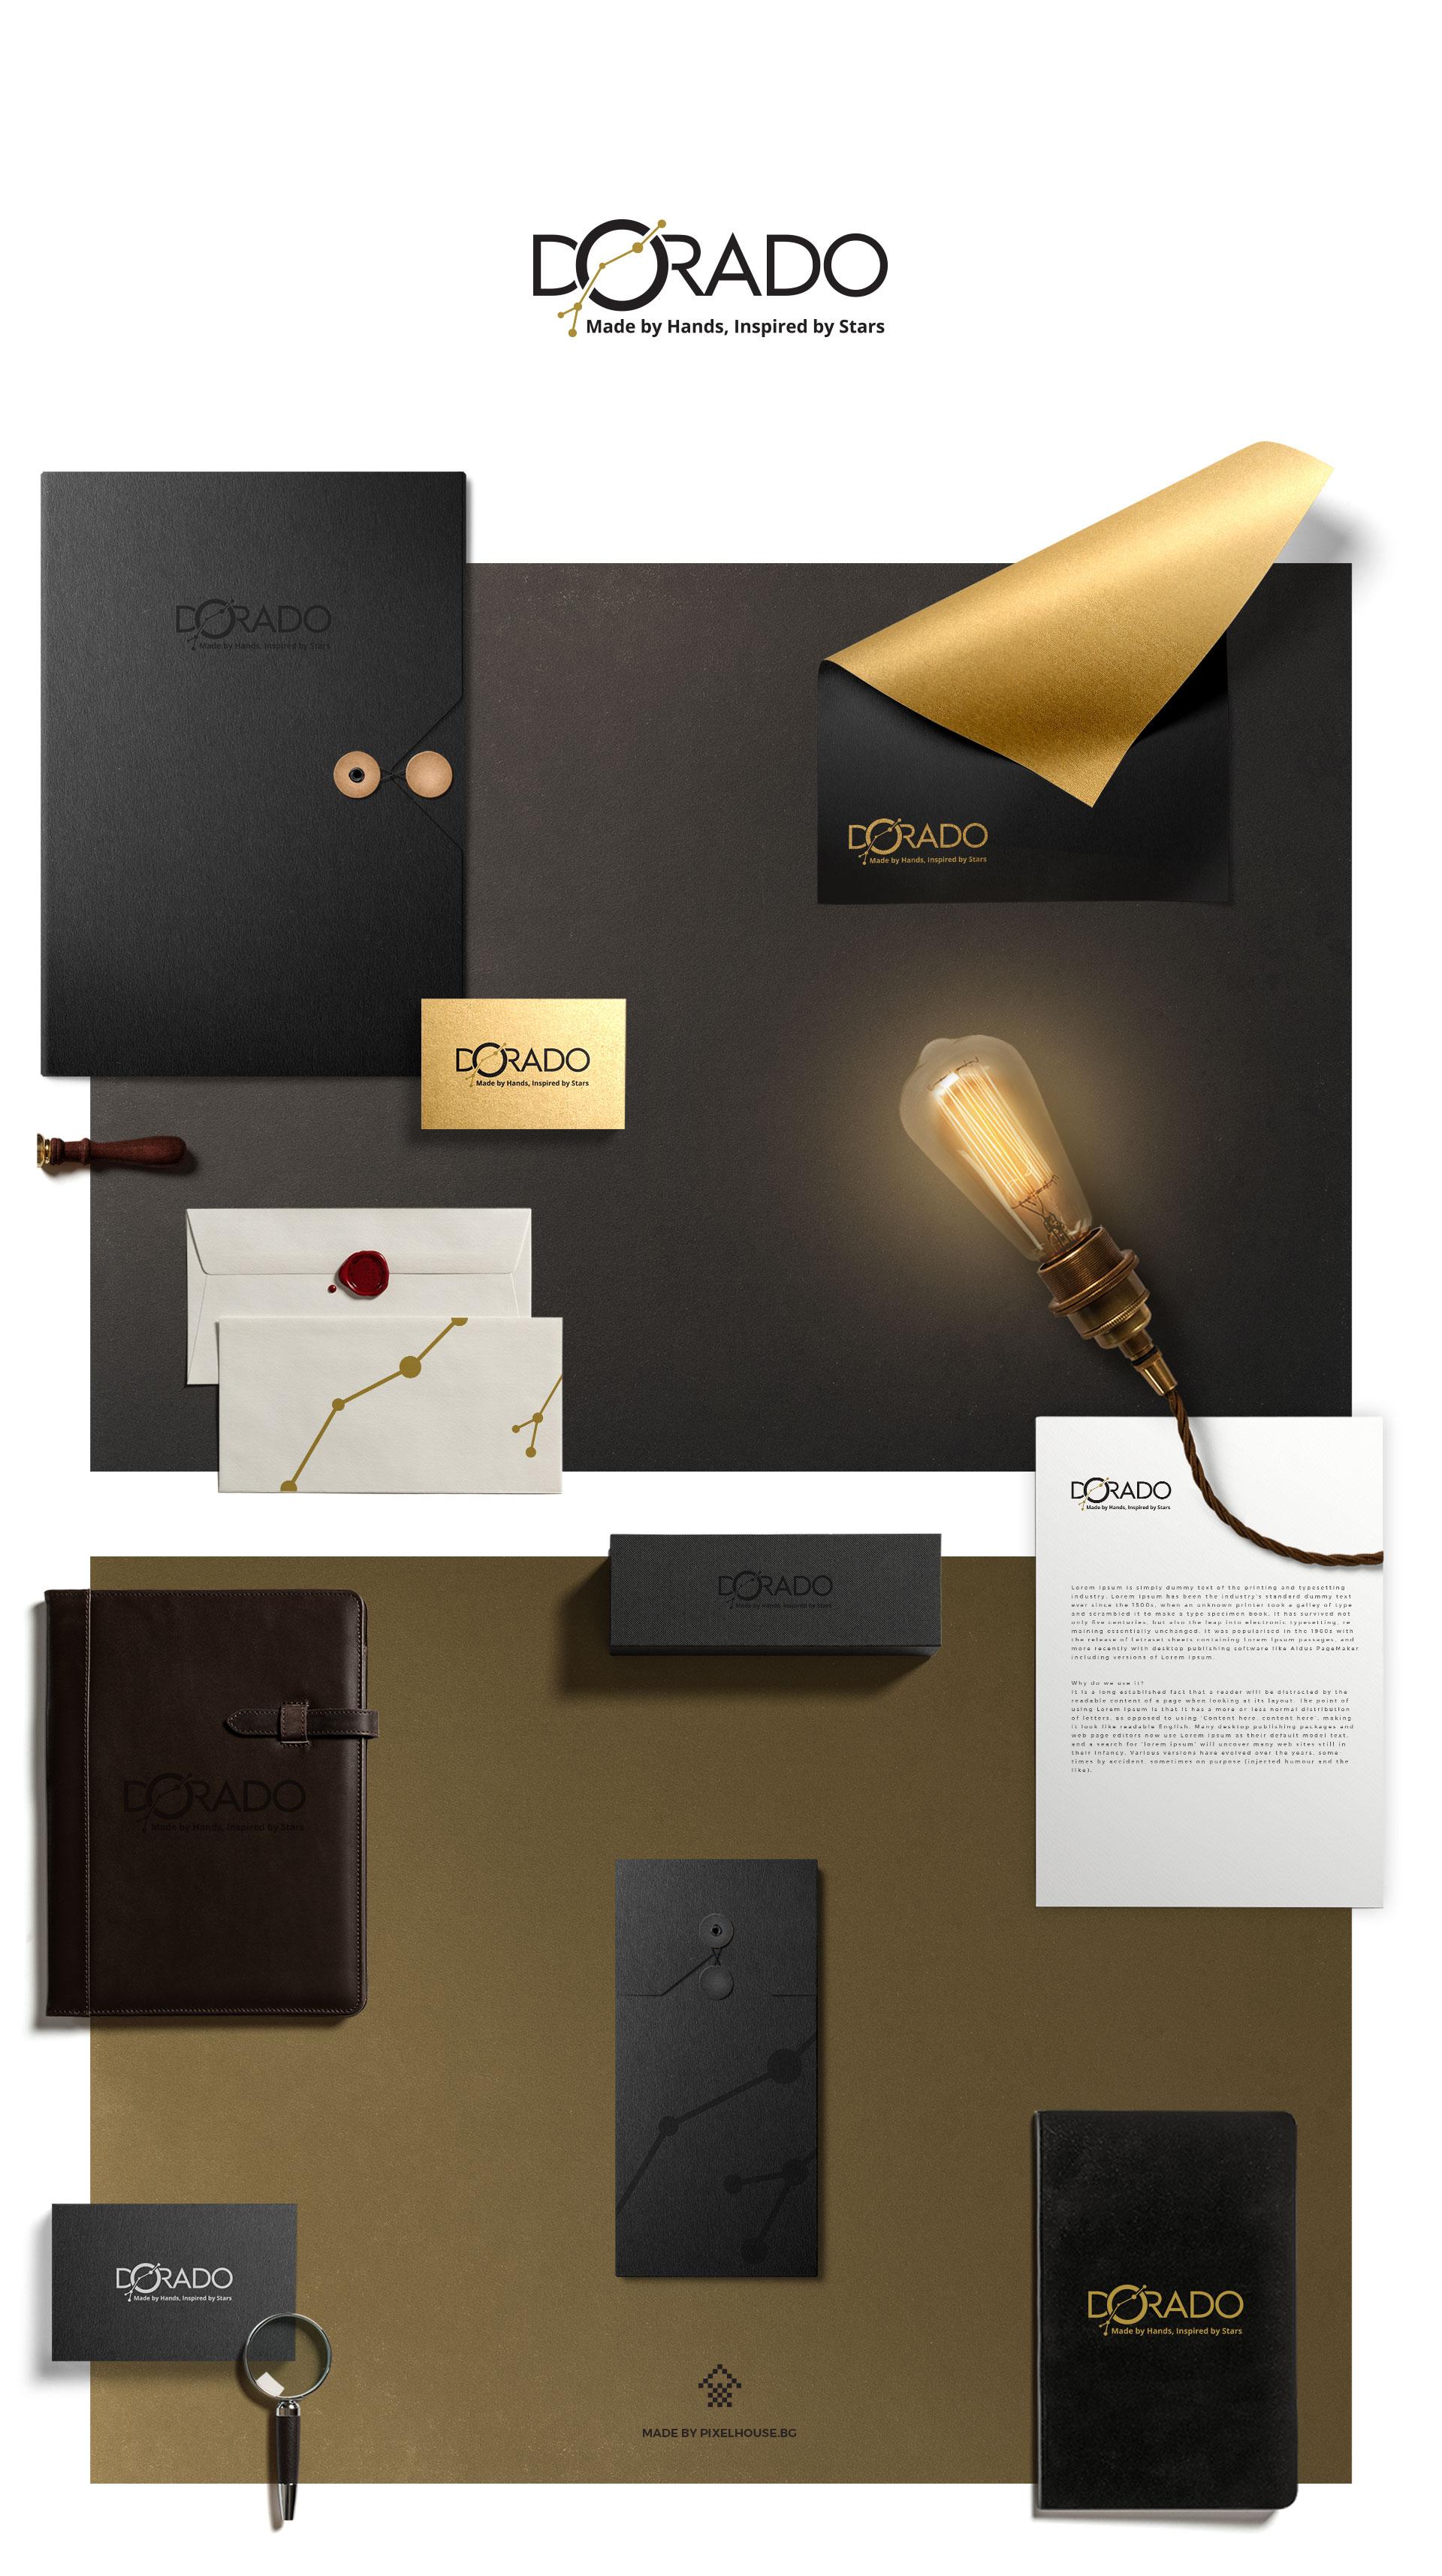 Dorado-Presentation-Full>